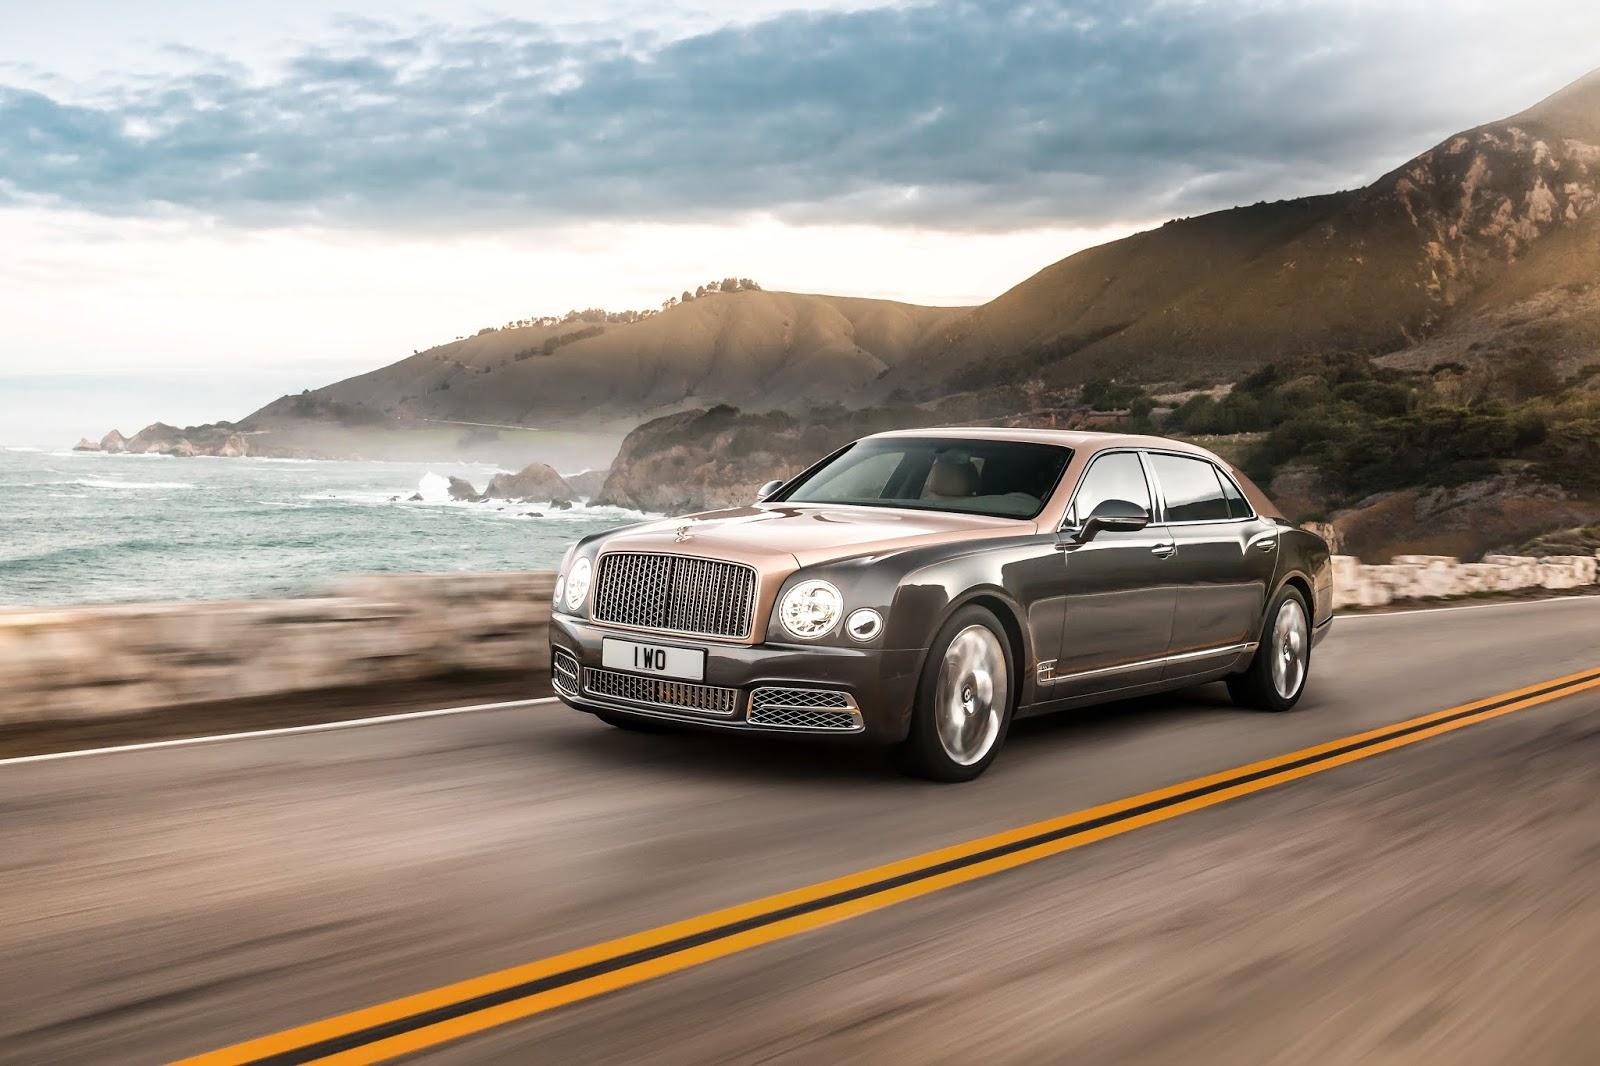 History2Bof2BMulsanne2BHERO Mulsanne. Η ιστορία και το τέλος εποχής της Μεγάλης Bentley.